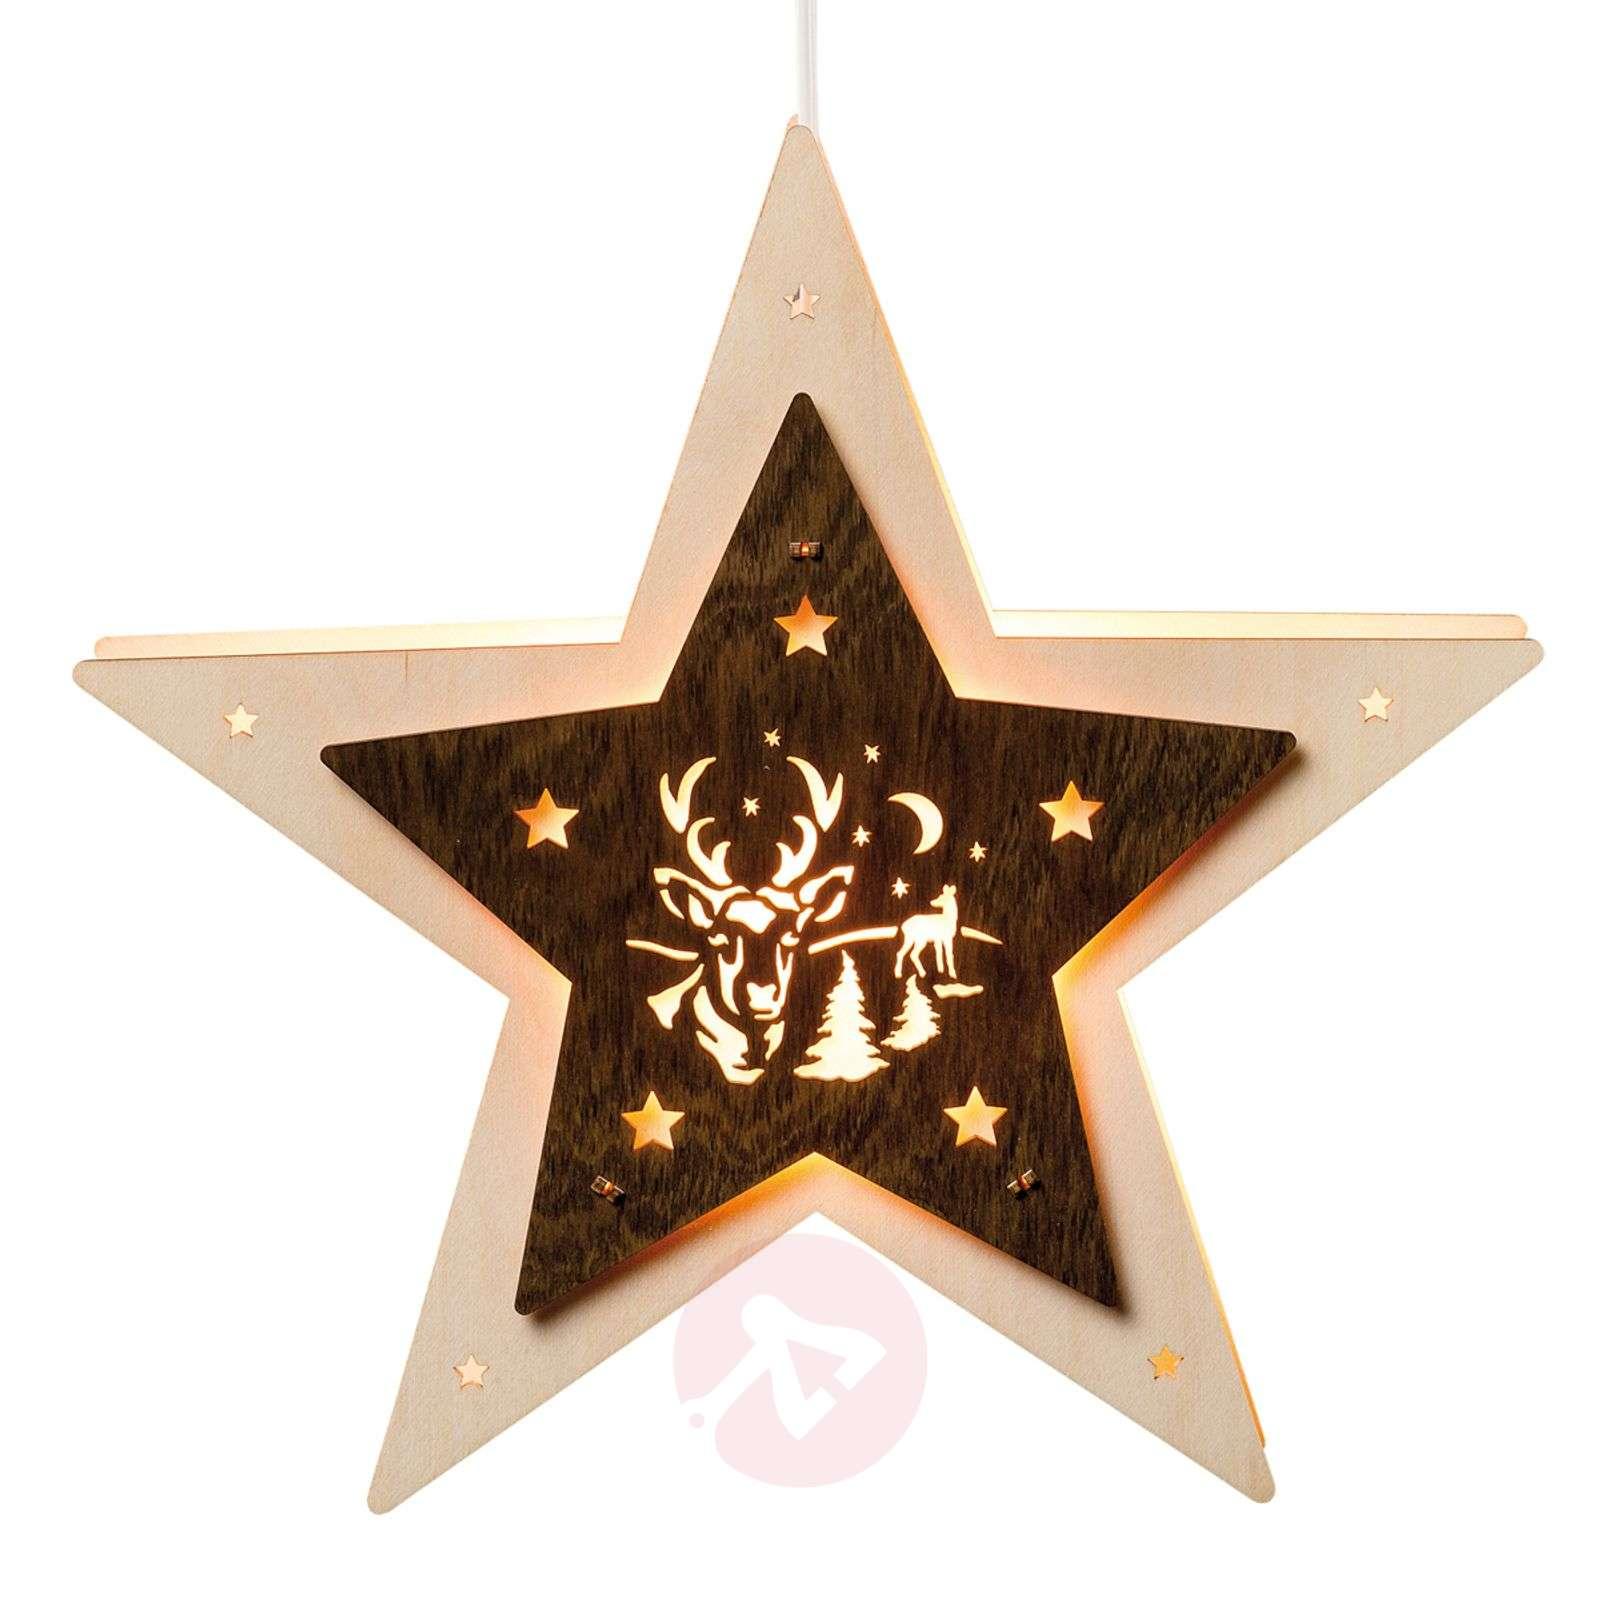 With LED lighting star window light-8501117-01